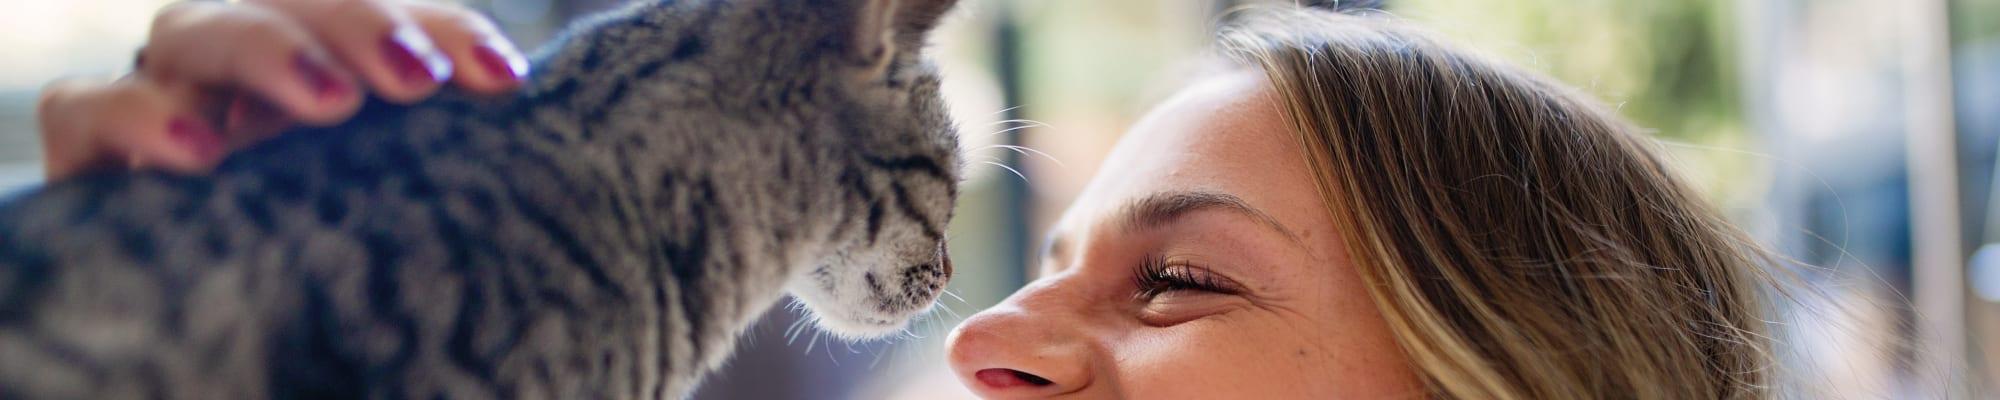 Pet policy at K Street Flats Apartment Homes in Berkeley, California